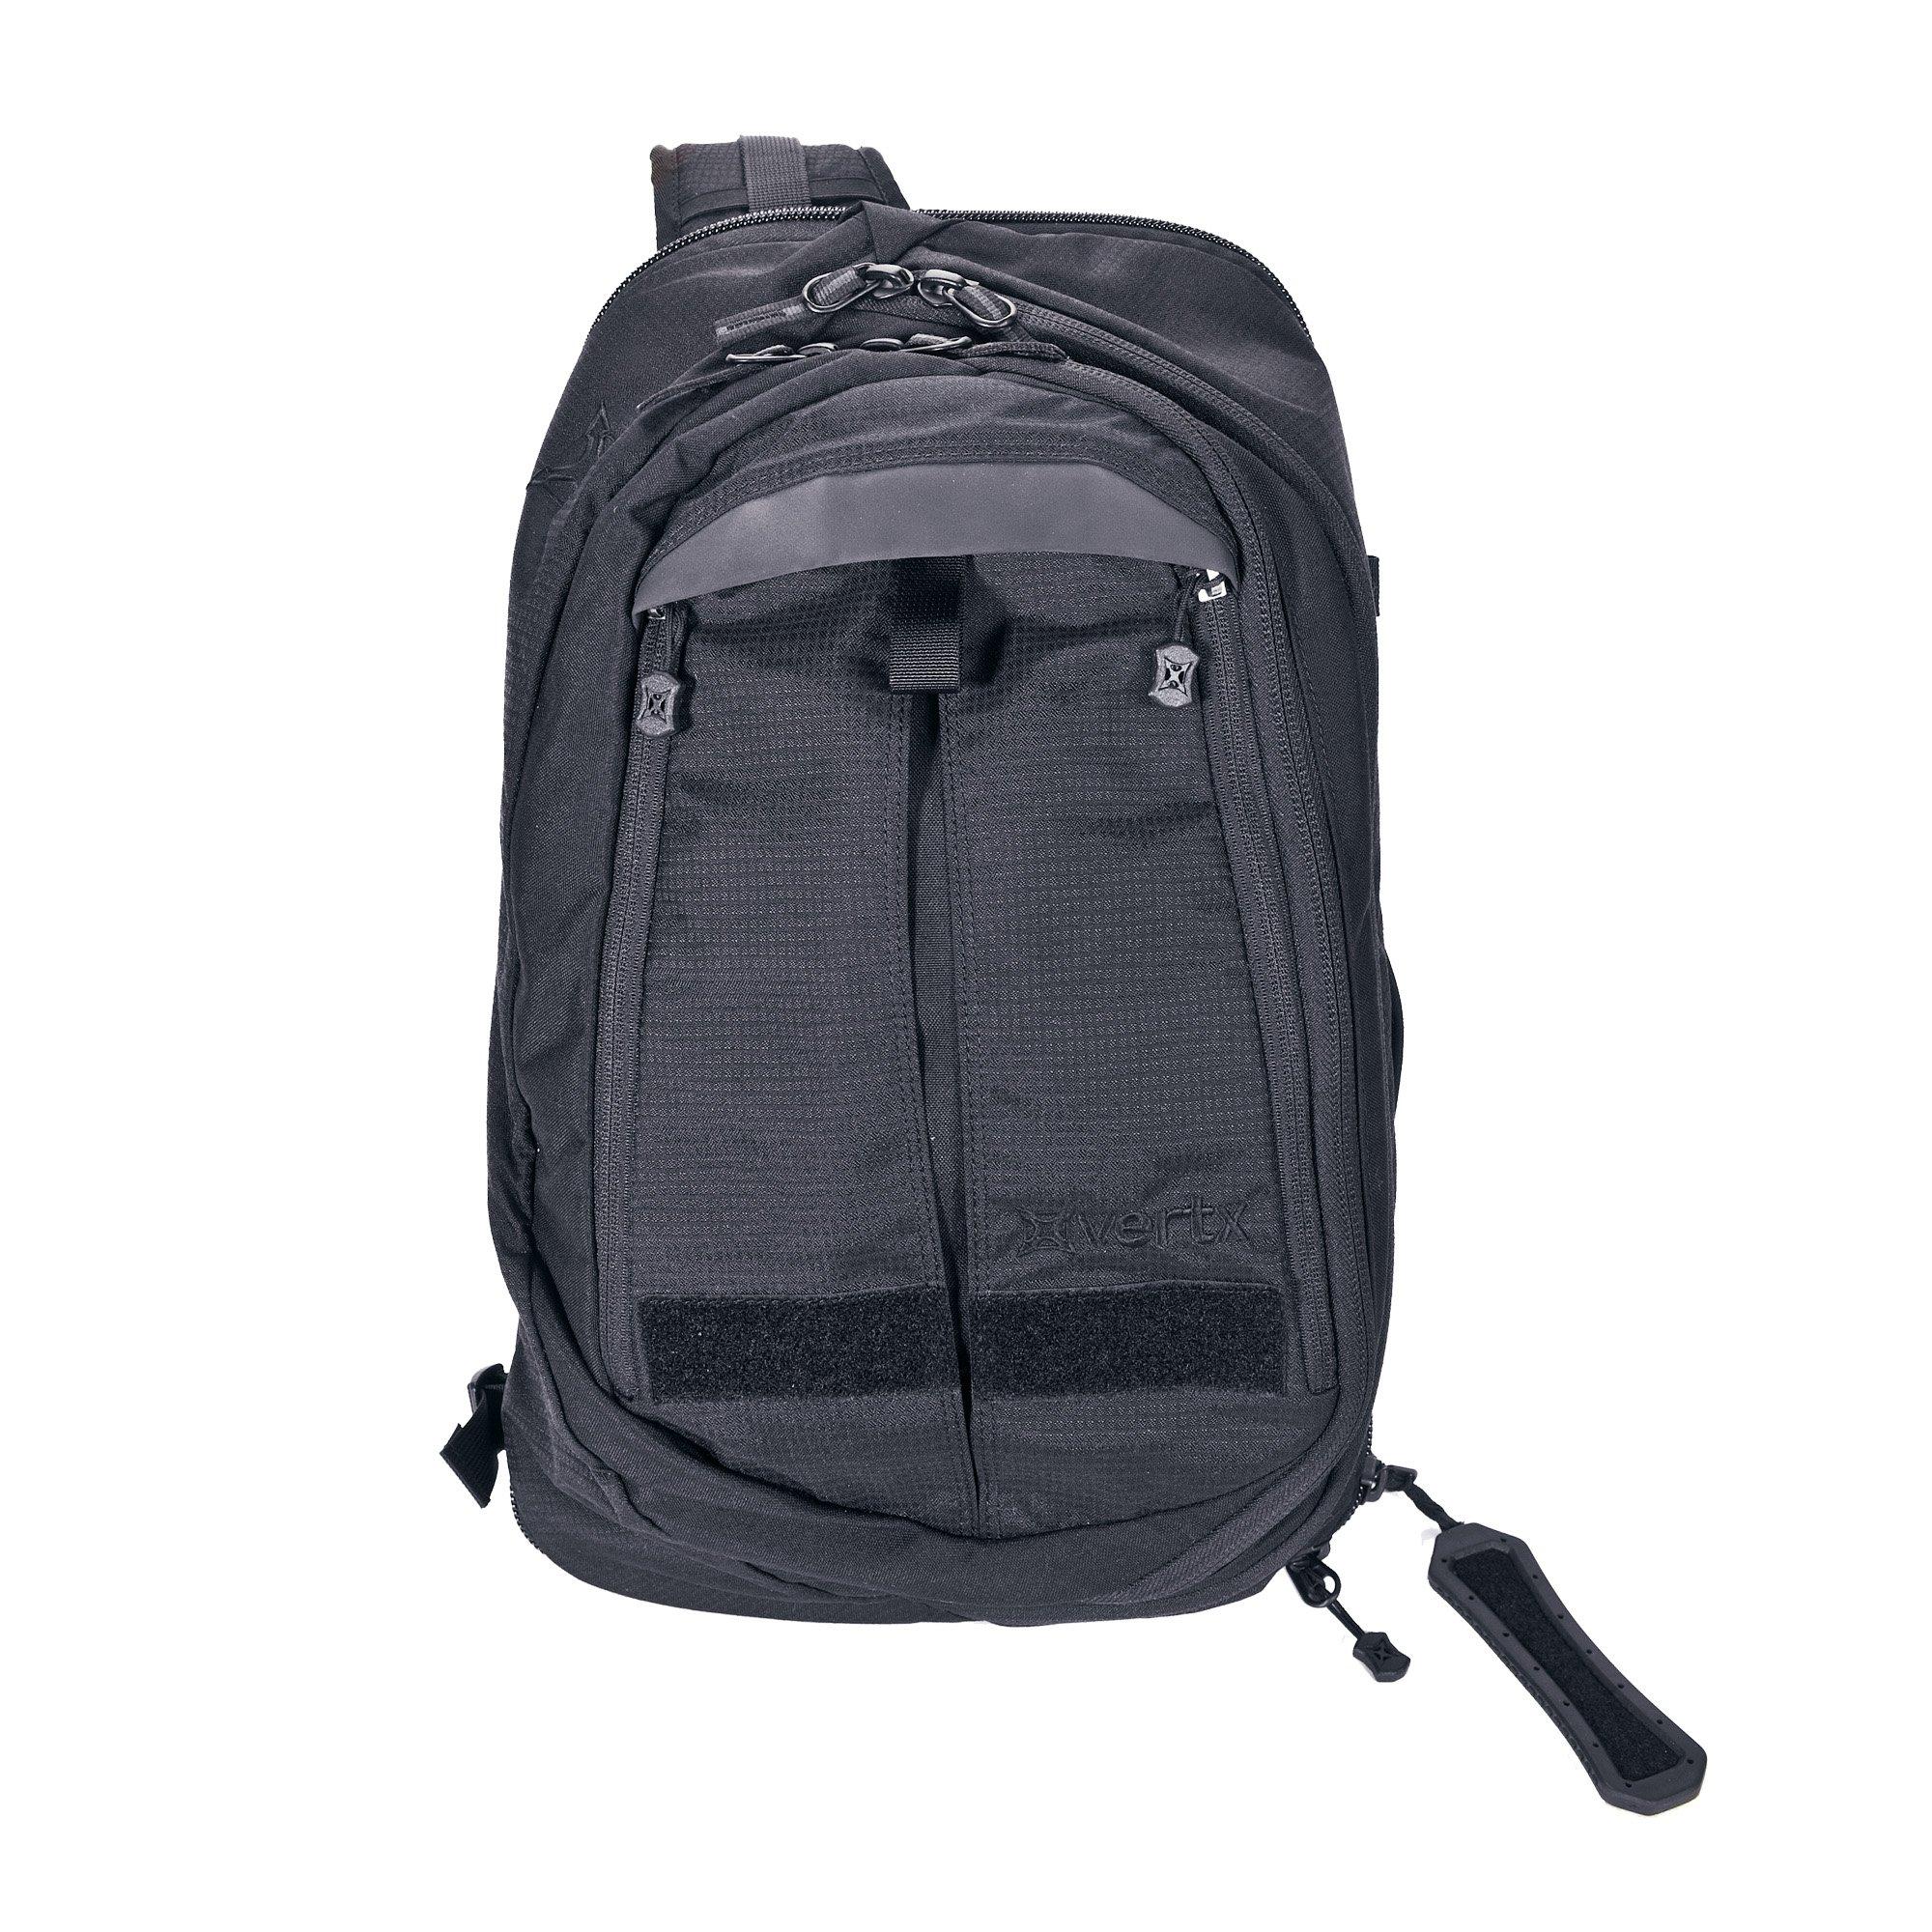 Vertx EDC Commuter Bag, Smoke Grey, One Size